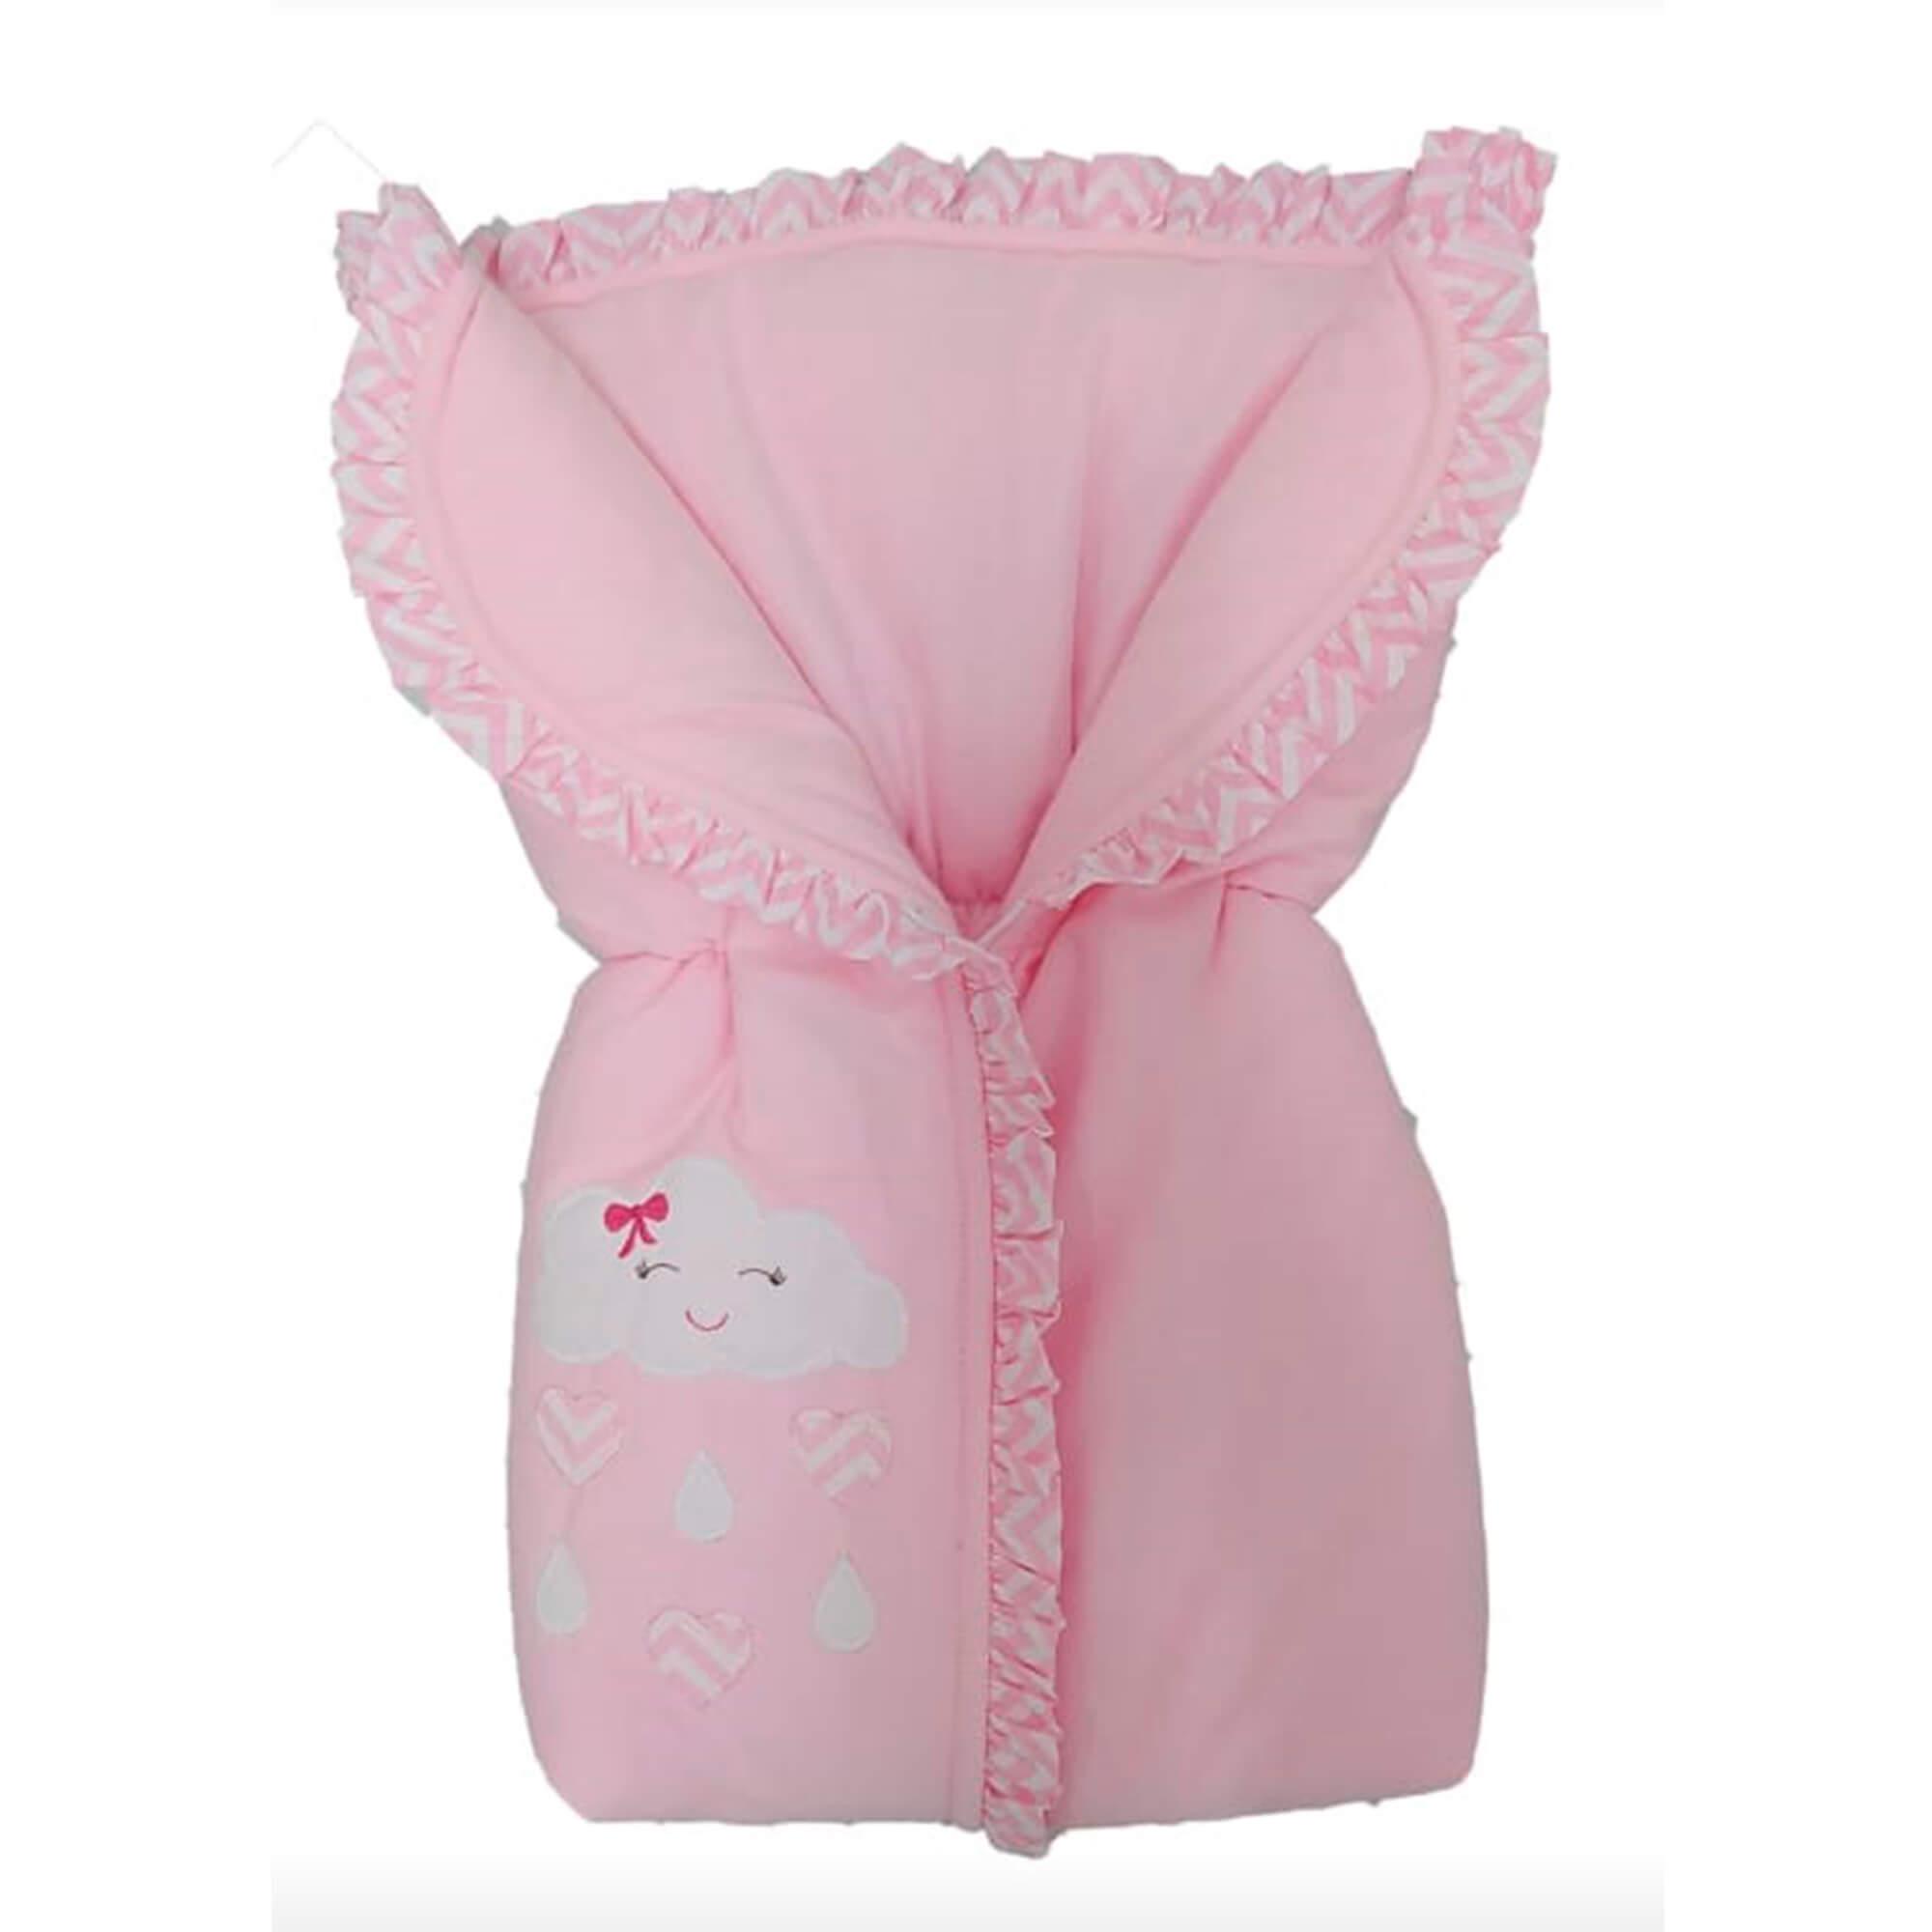 Porta Bebê Saco De Dormir Flanela Chuva de Amor